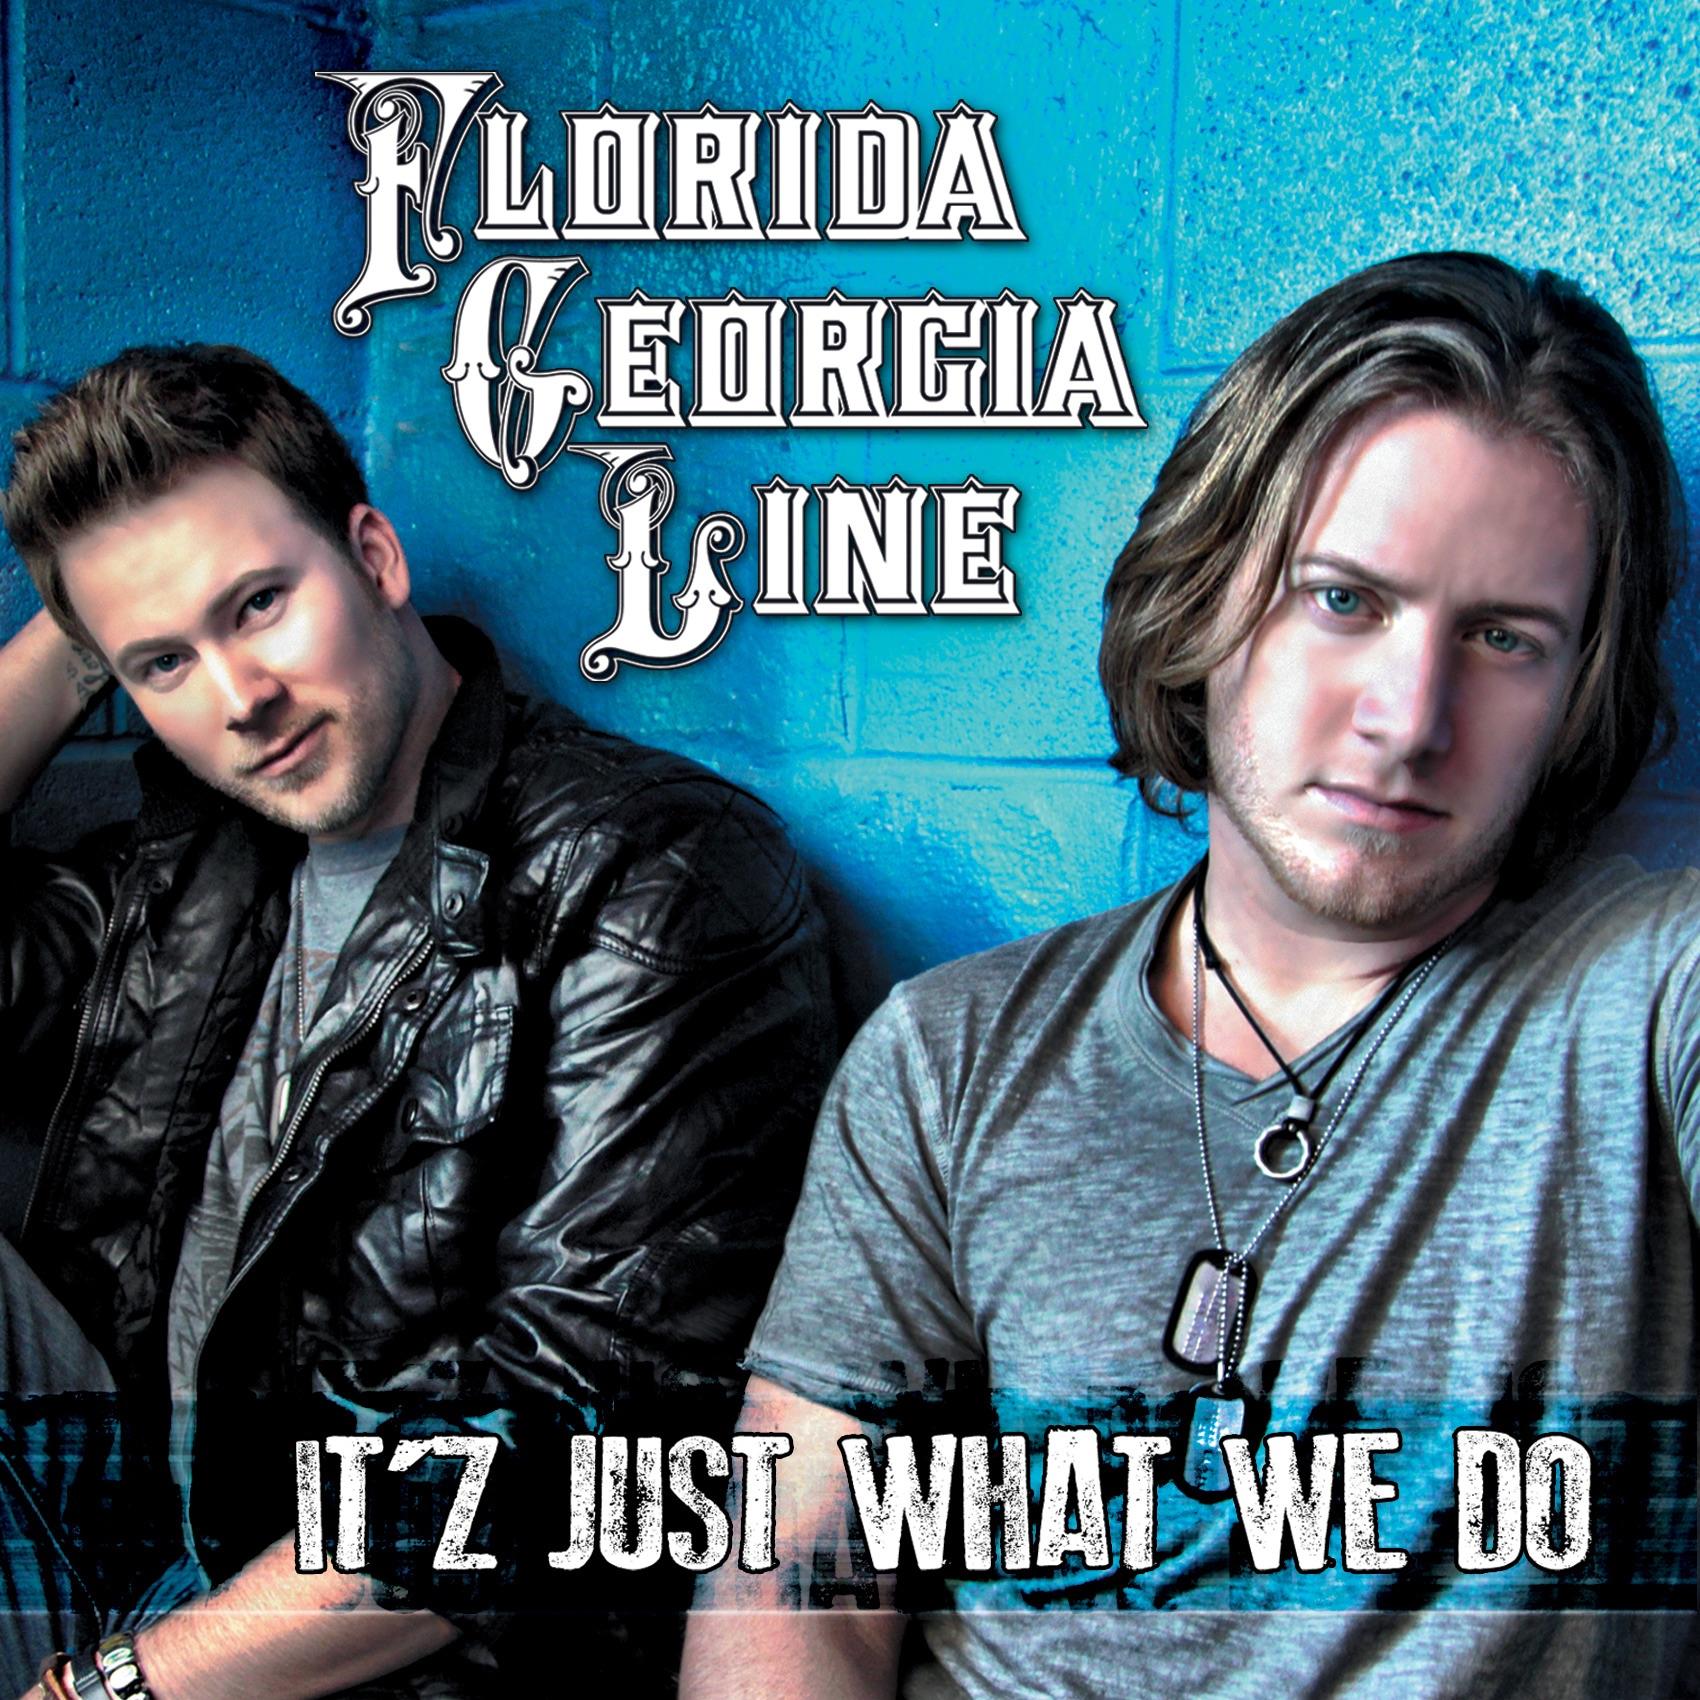 Florida Georgia Line album It'z Just What We Do - EP